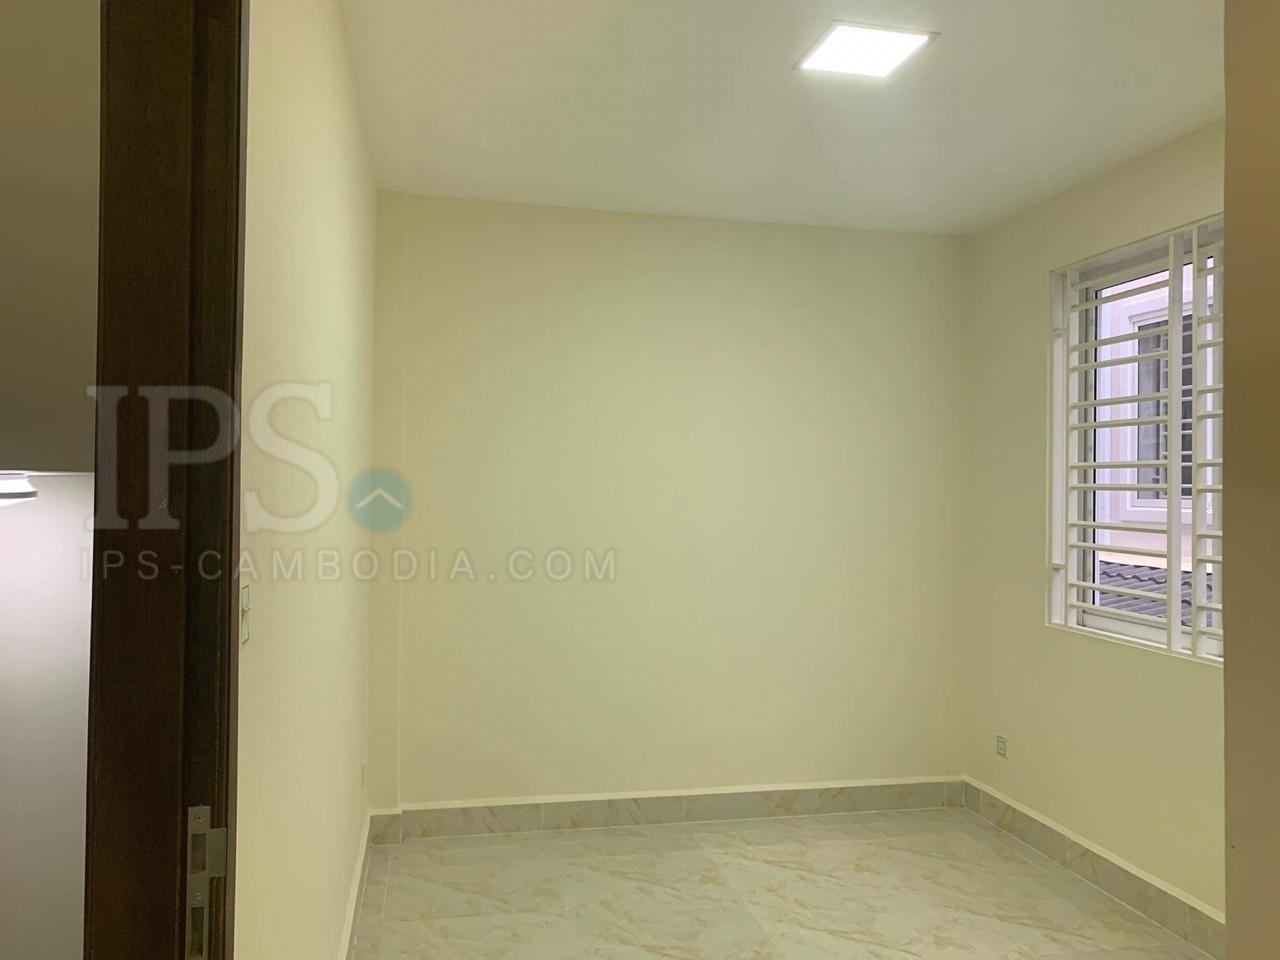 3 Bedroom Townhouse For Rent - Sen Sok, Phnom Penh